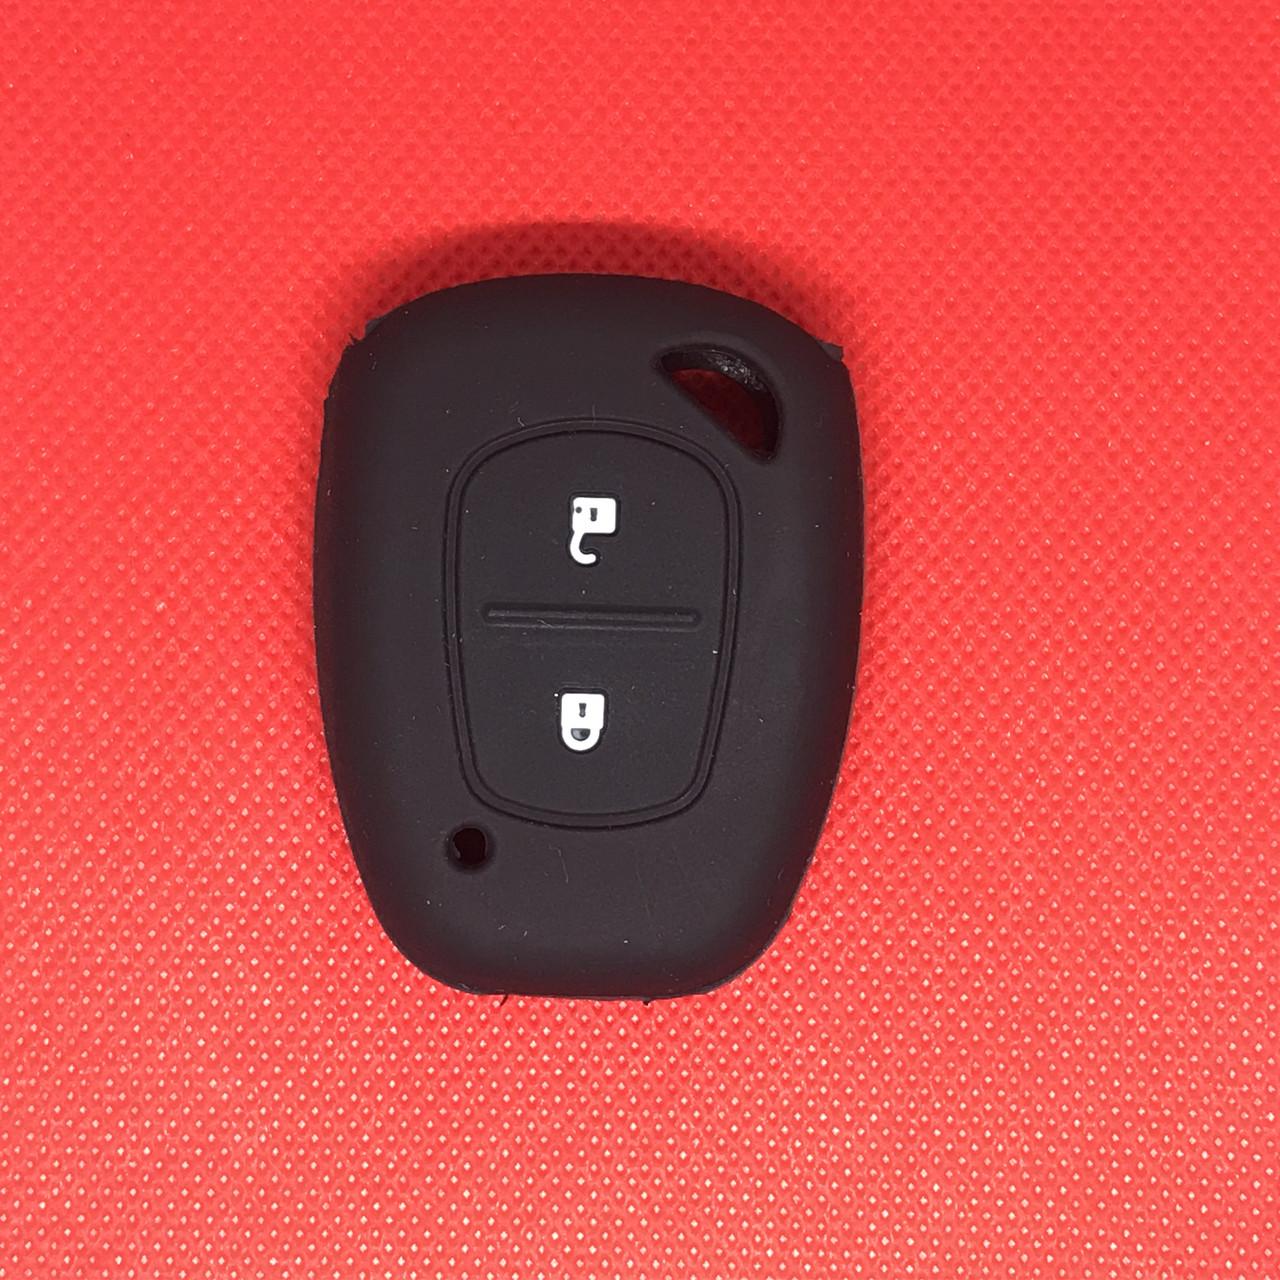 Чехол на ключ Рено Трафик Renault Trafic 2 кн черный